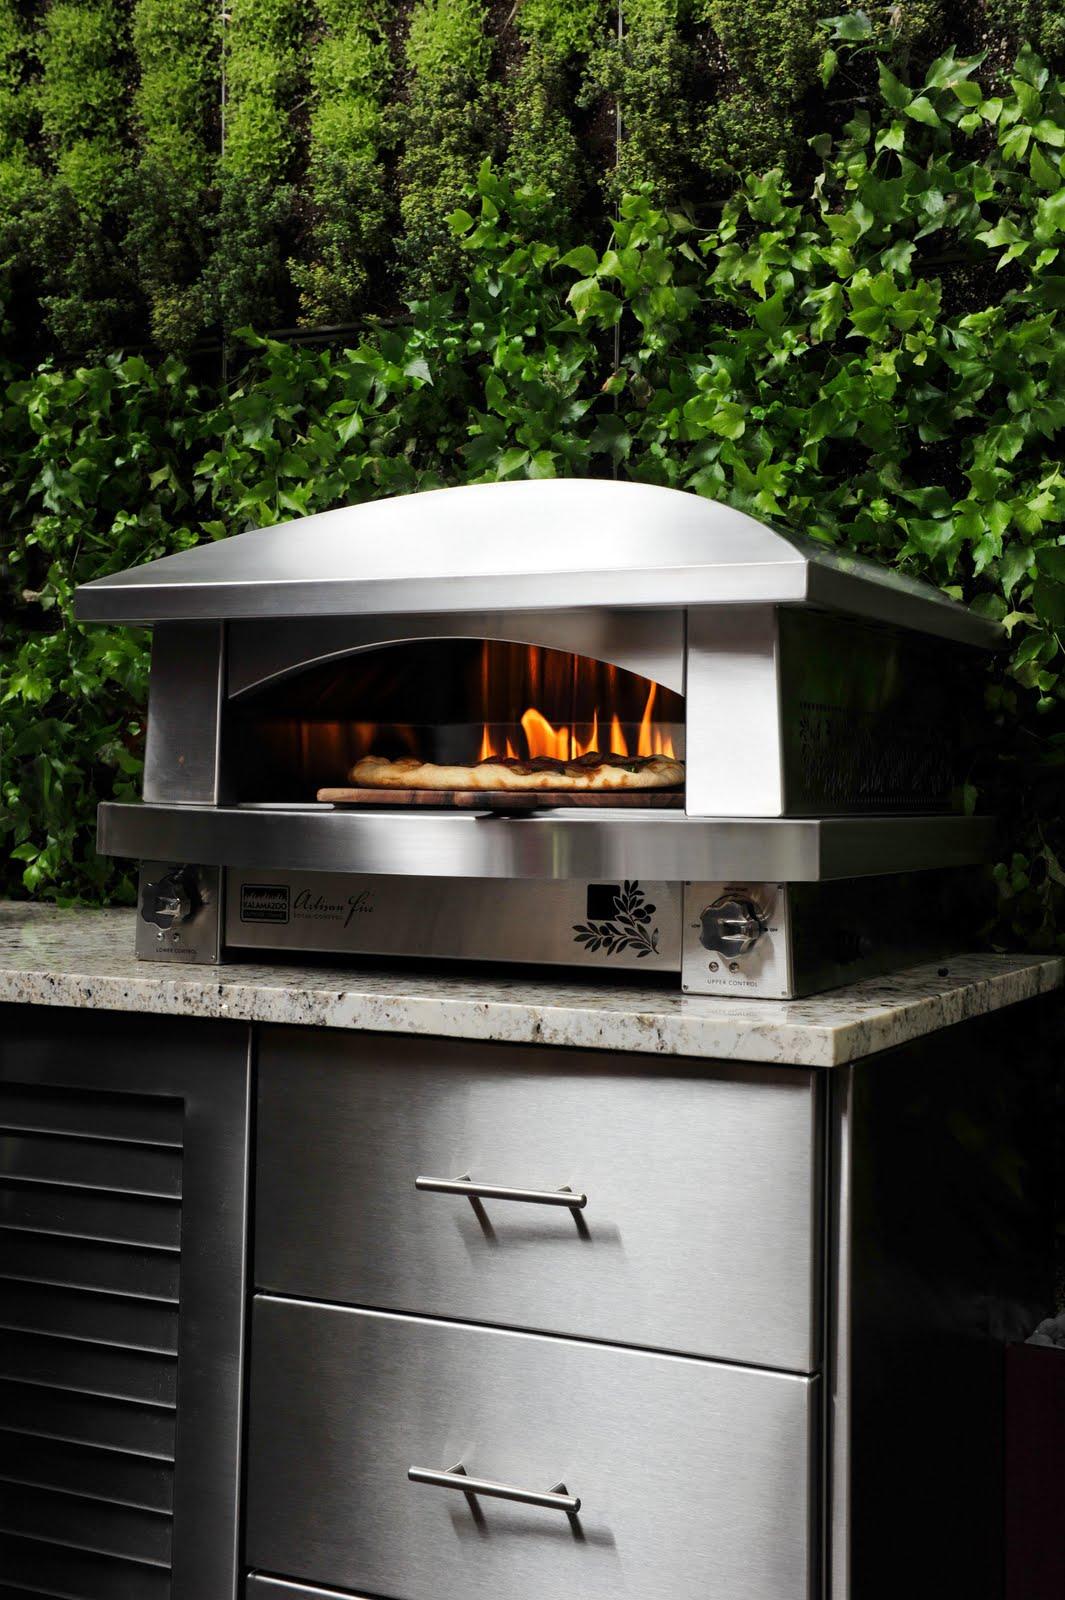 Outdoor Kitchen Design Pictures